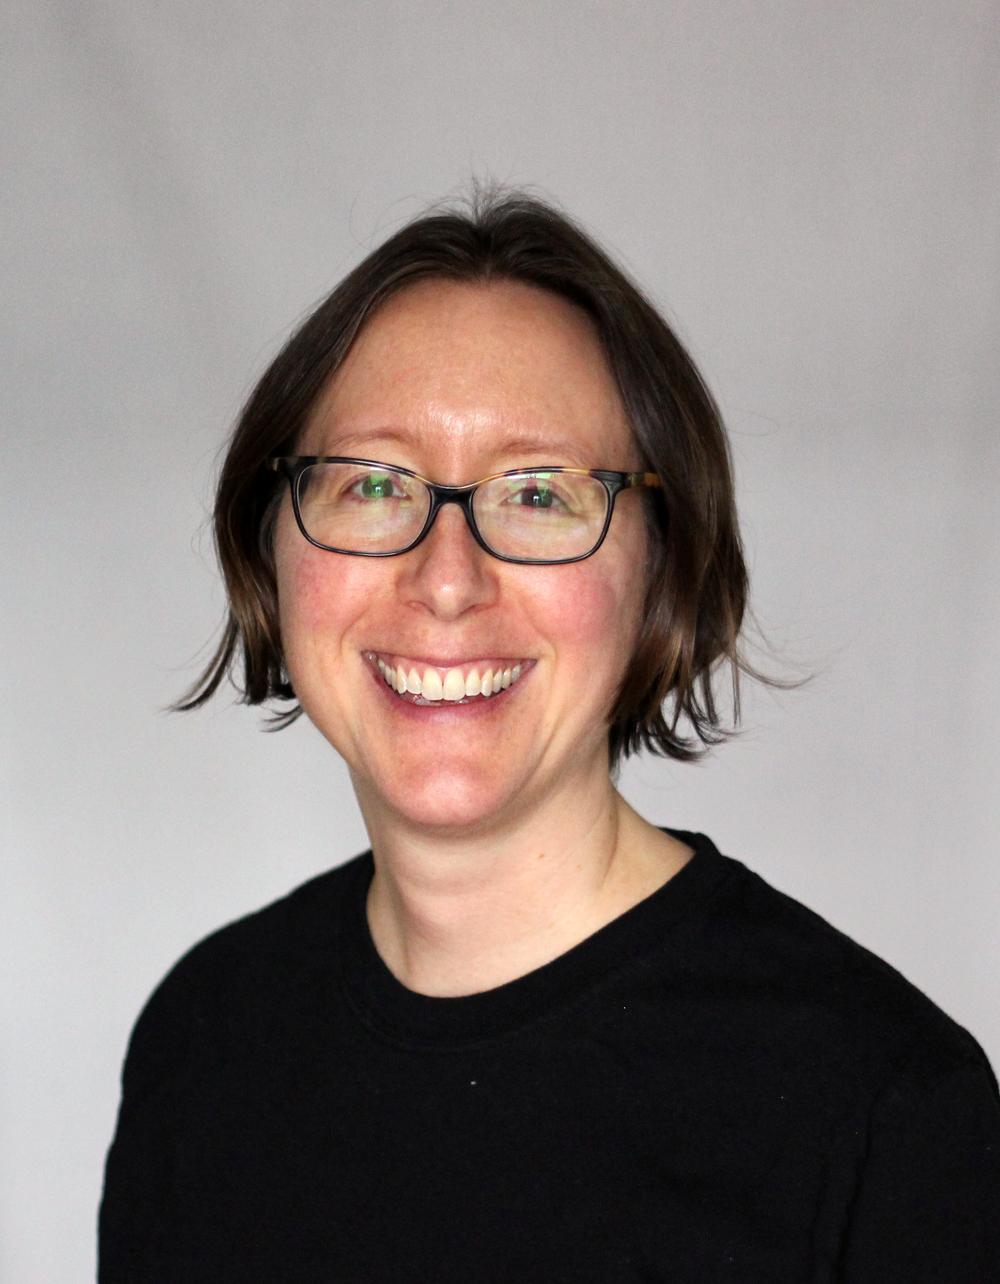 Jennifer Klare, Ph.D. - Senior Director of Applications and Operations